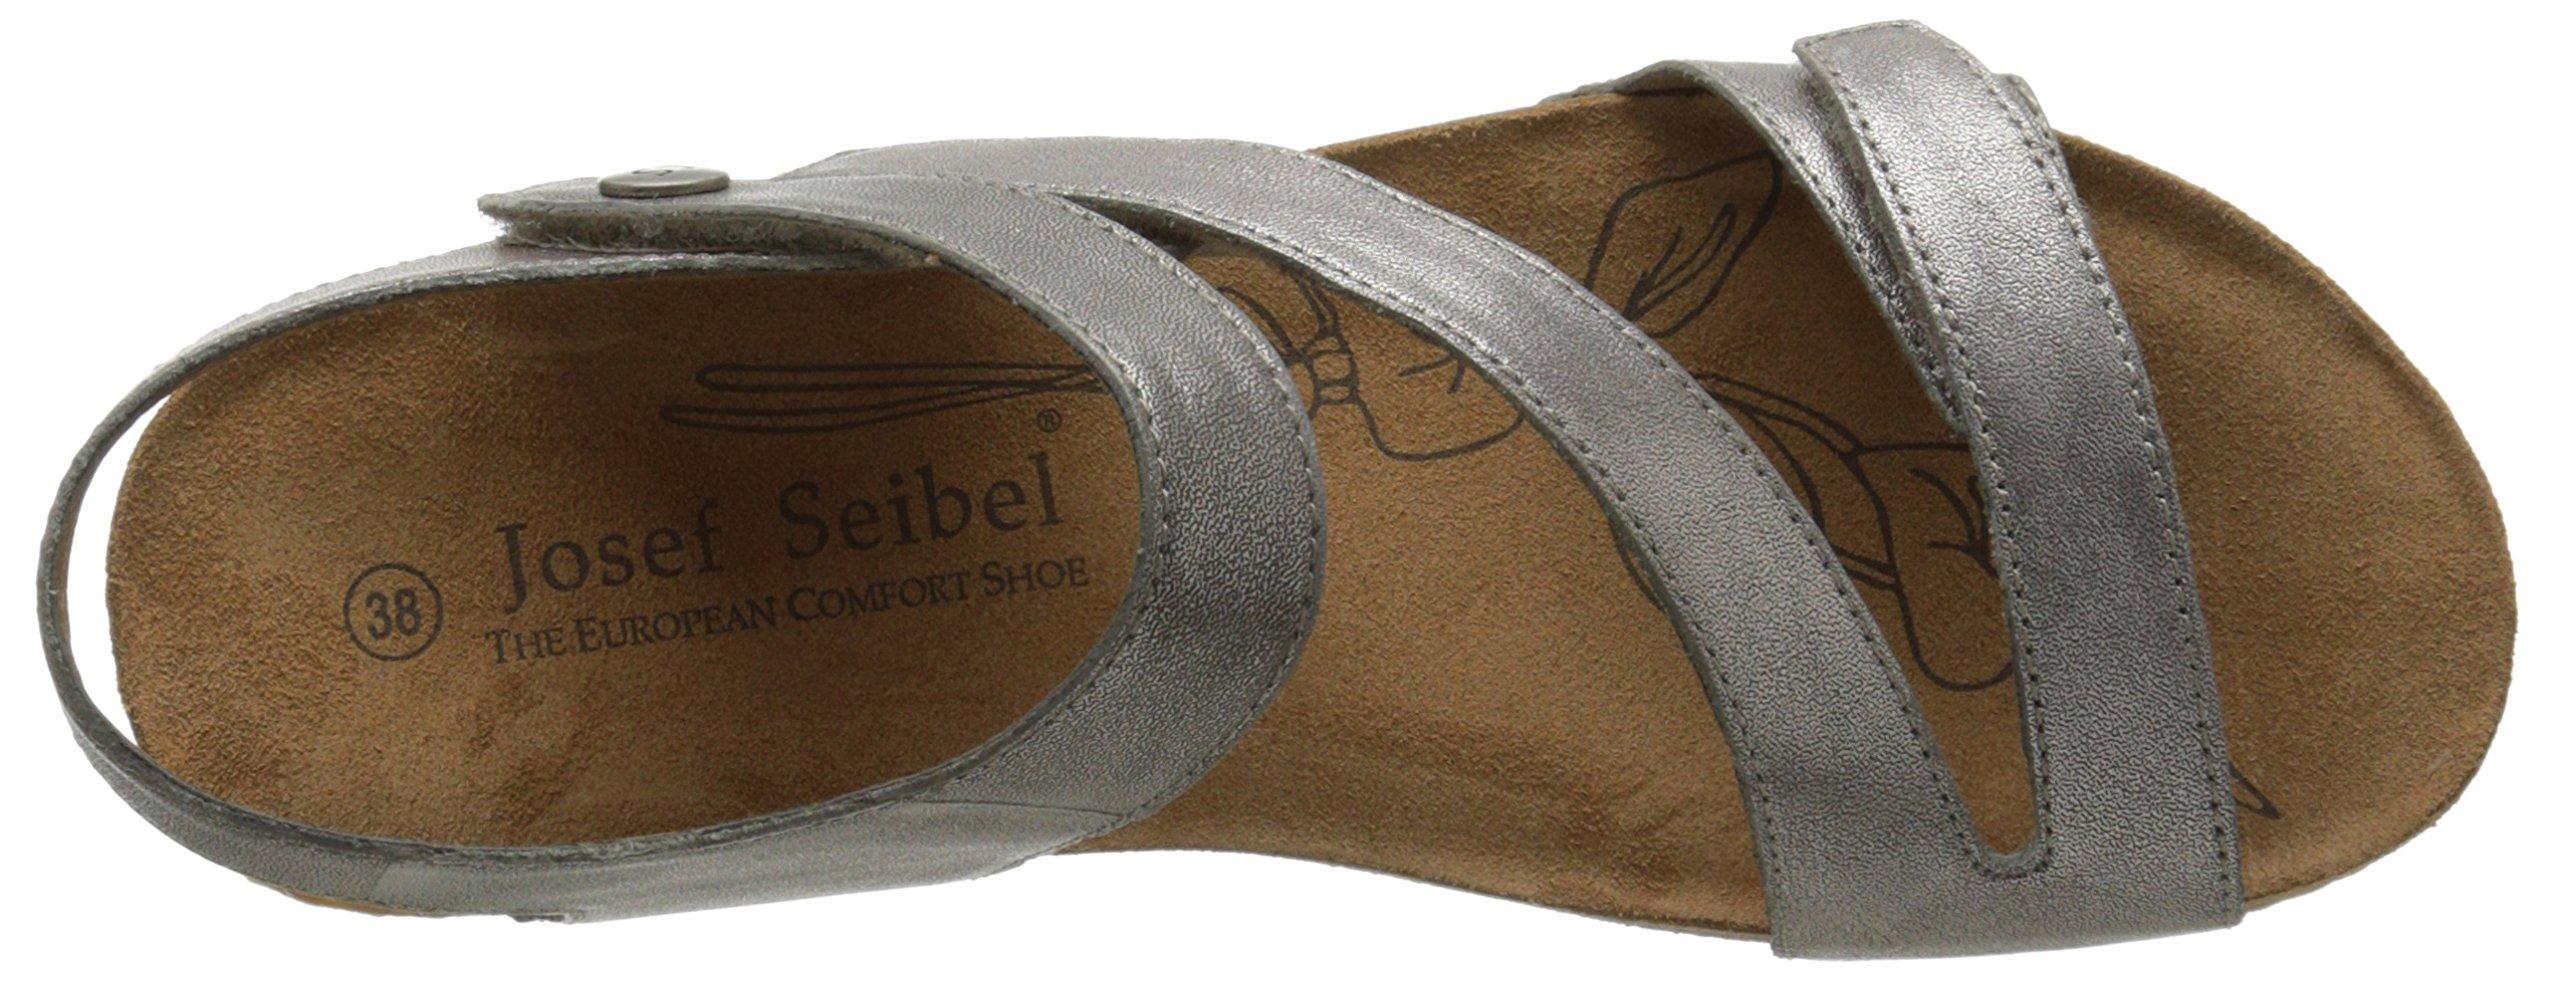 Josef Seibel Women's Tonga 25 dress Sandal, Cristal, 41 EU/10-10.5 M US by Josef Seibel (Image #8)